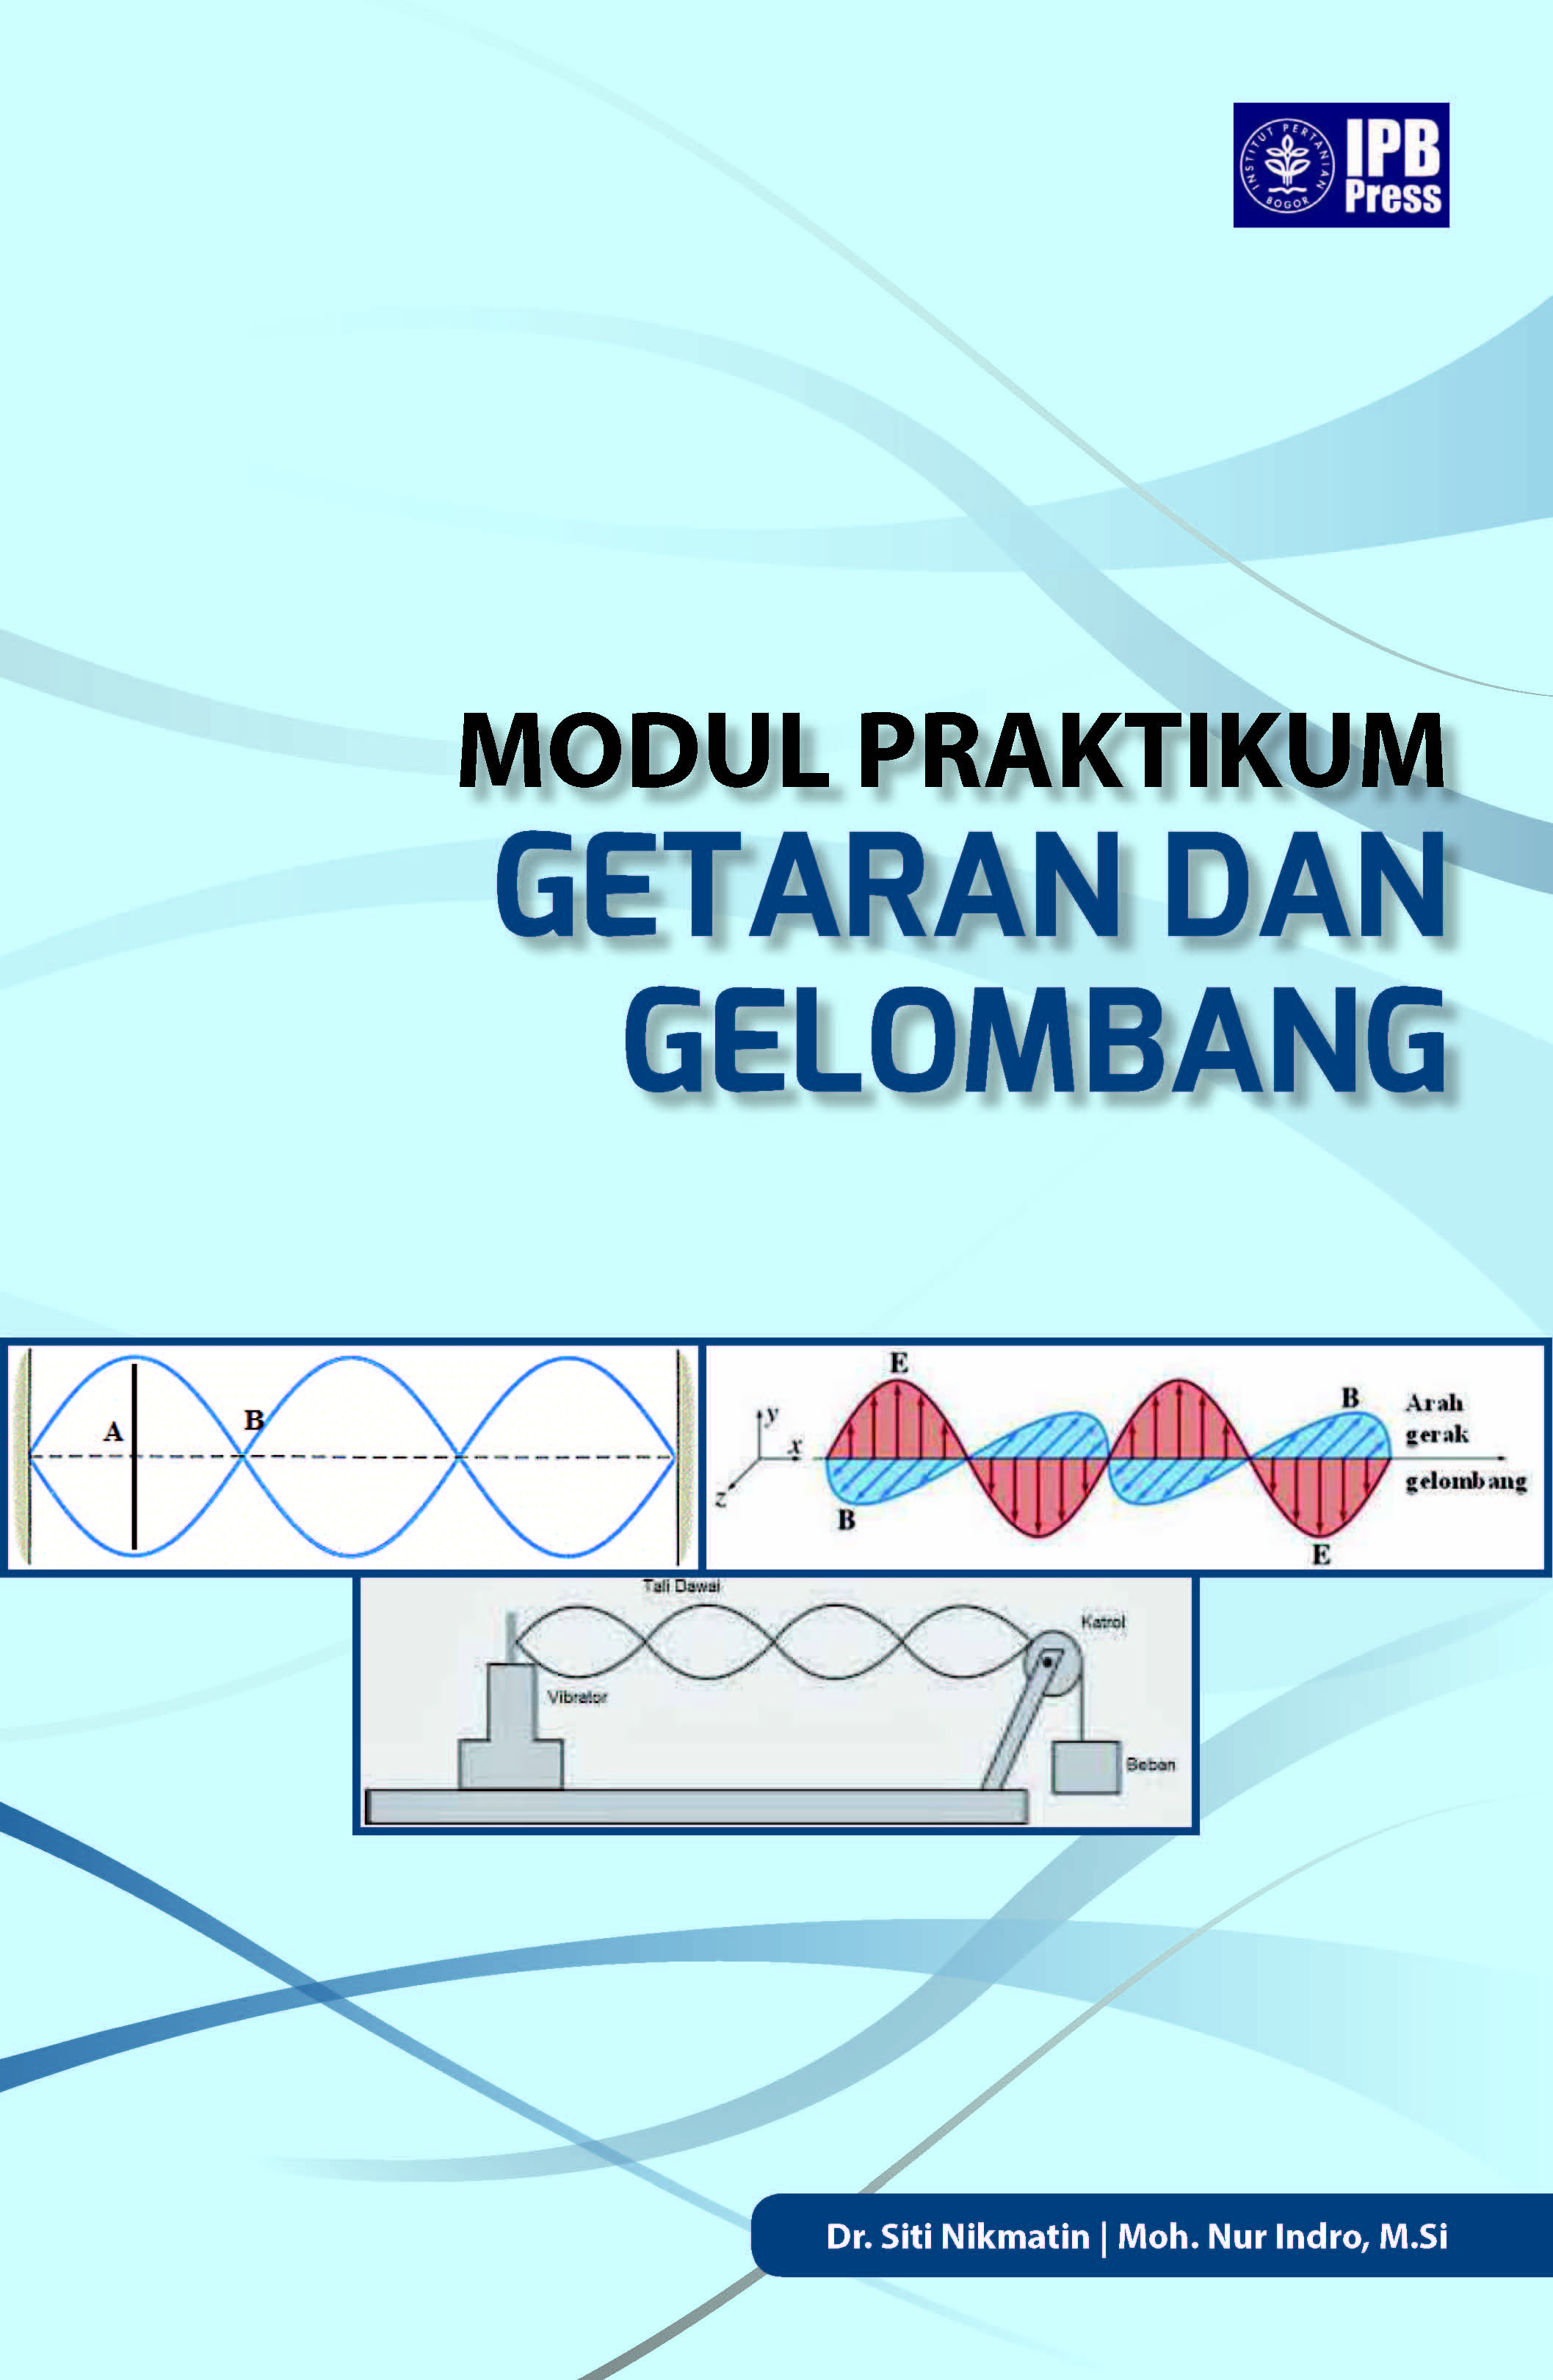 Modul praktikum getaran dan gelombang [sumber elektronis]